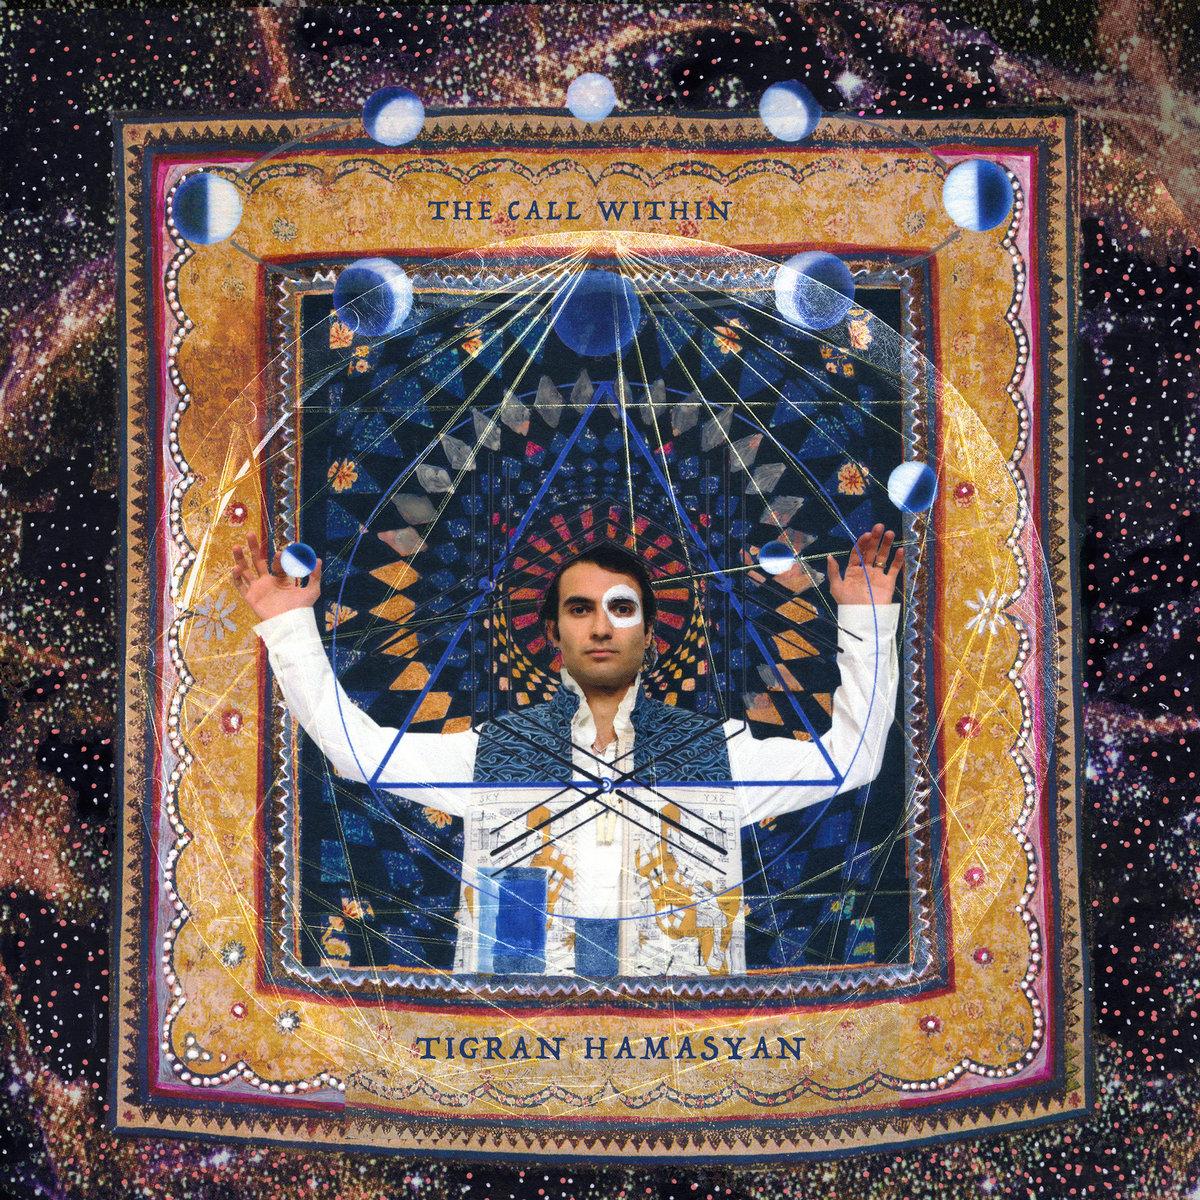 Tigran Hamasyan - The Call Within [LP]